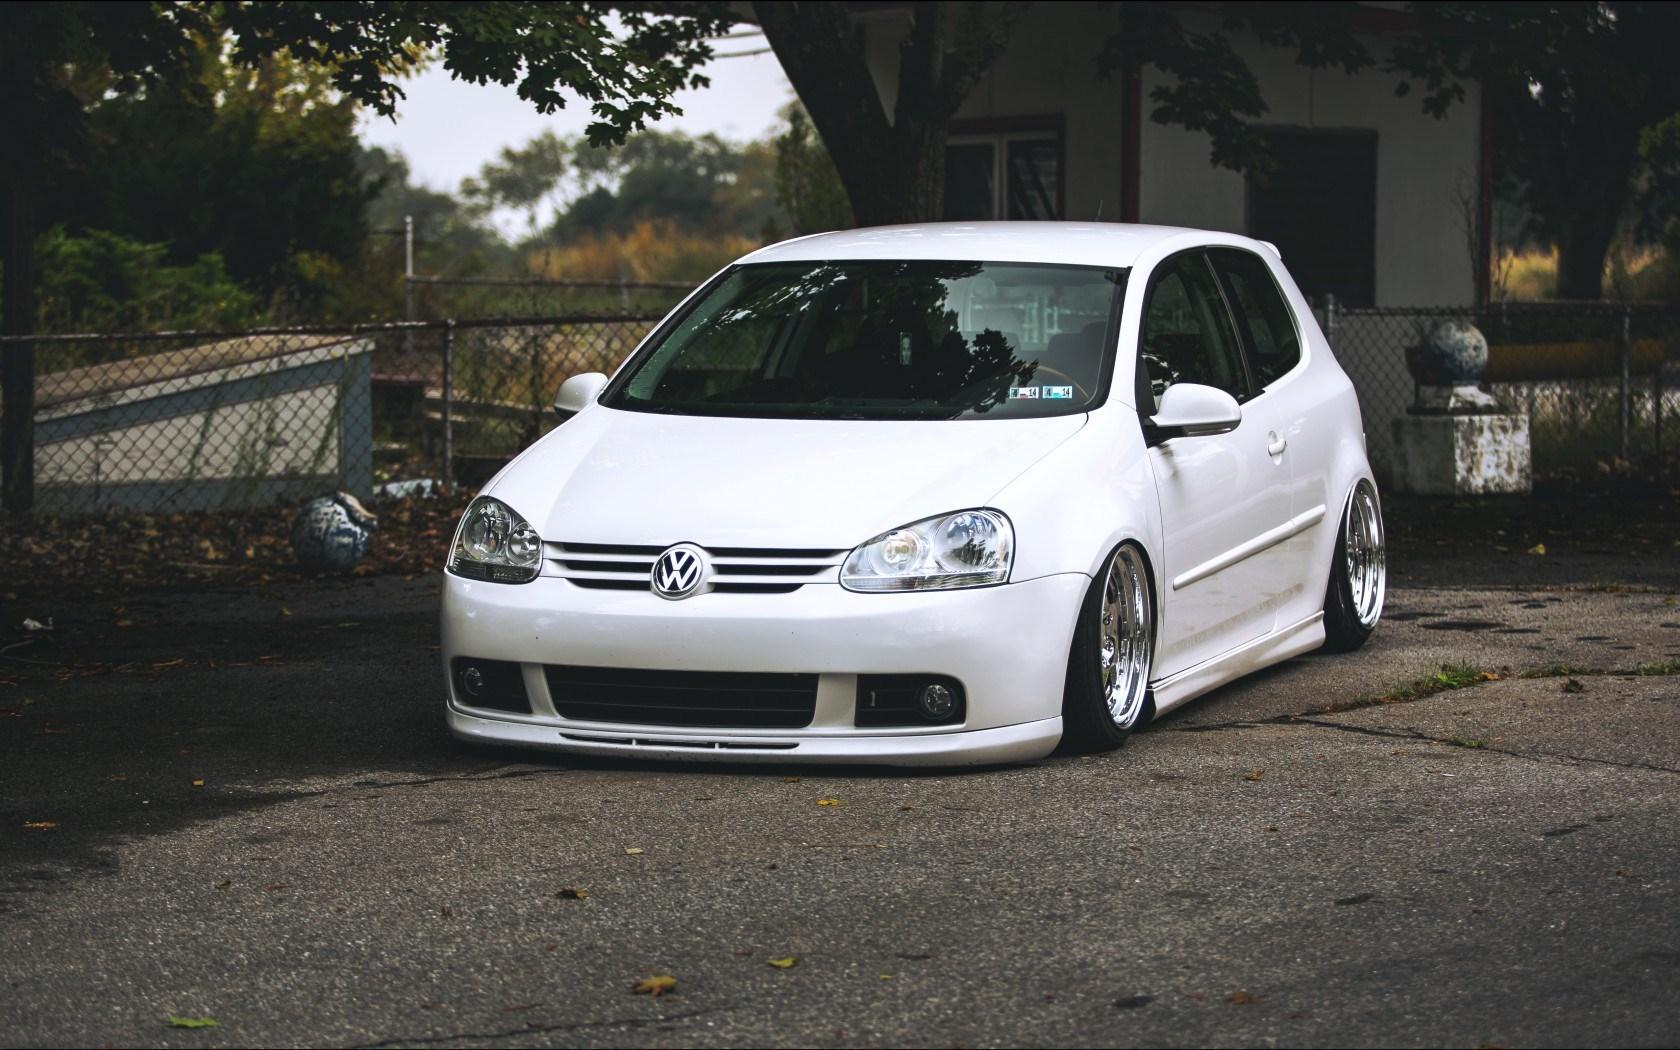 Volkswagen Golf MK5 Tuning Car